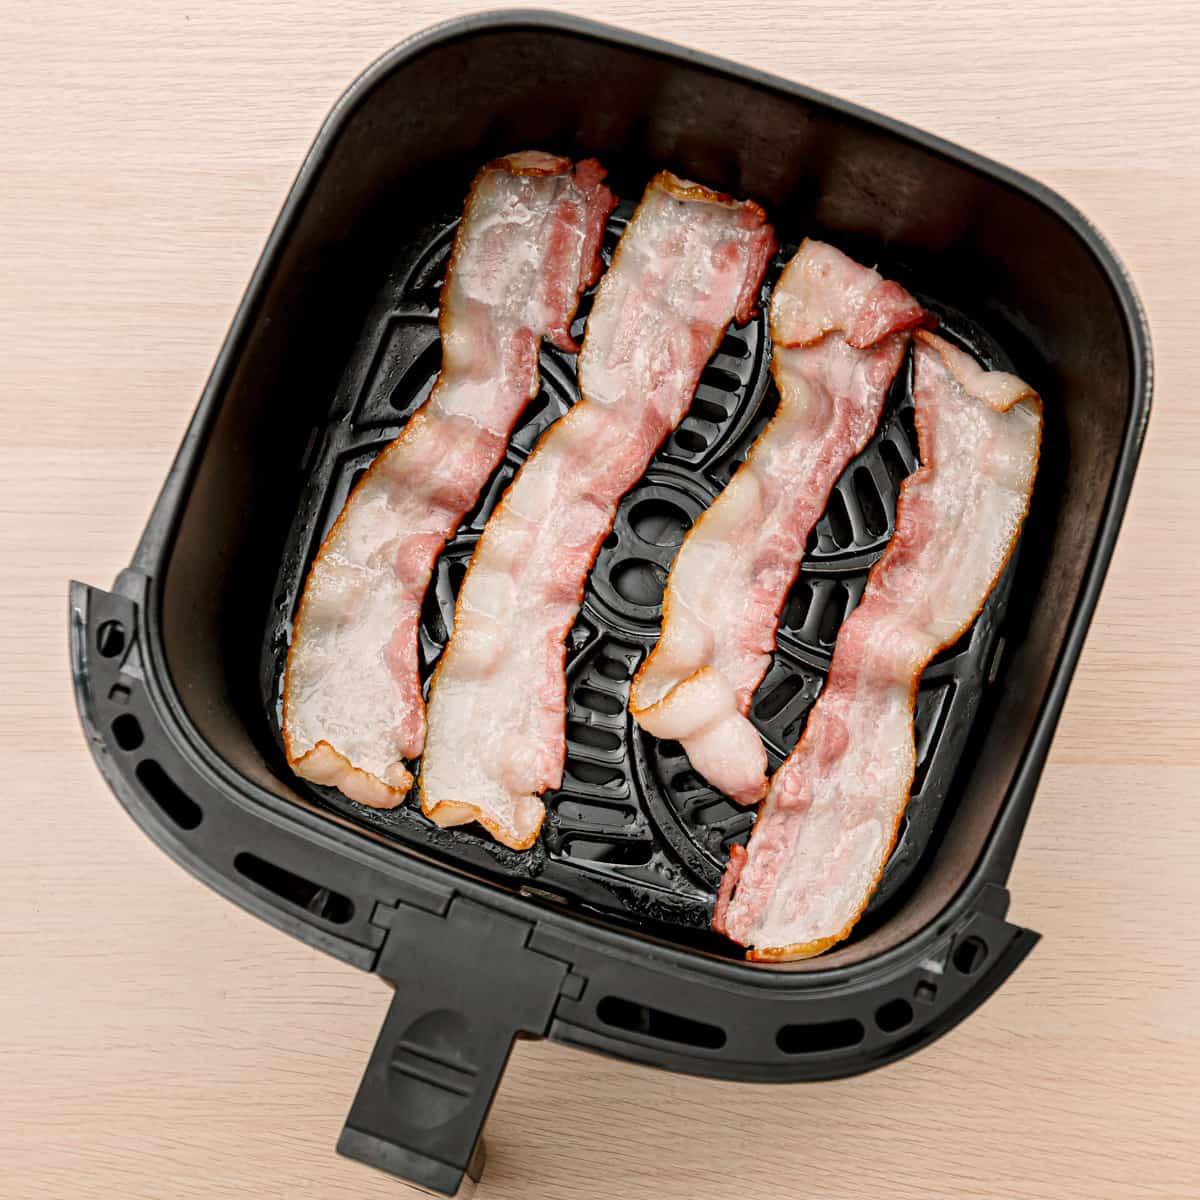 bacon in an air fryer.